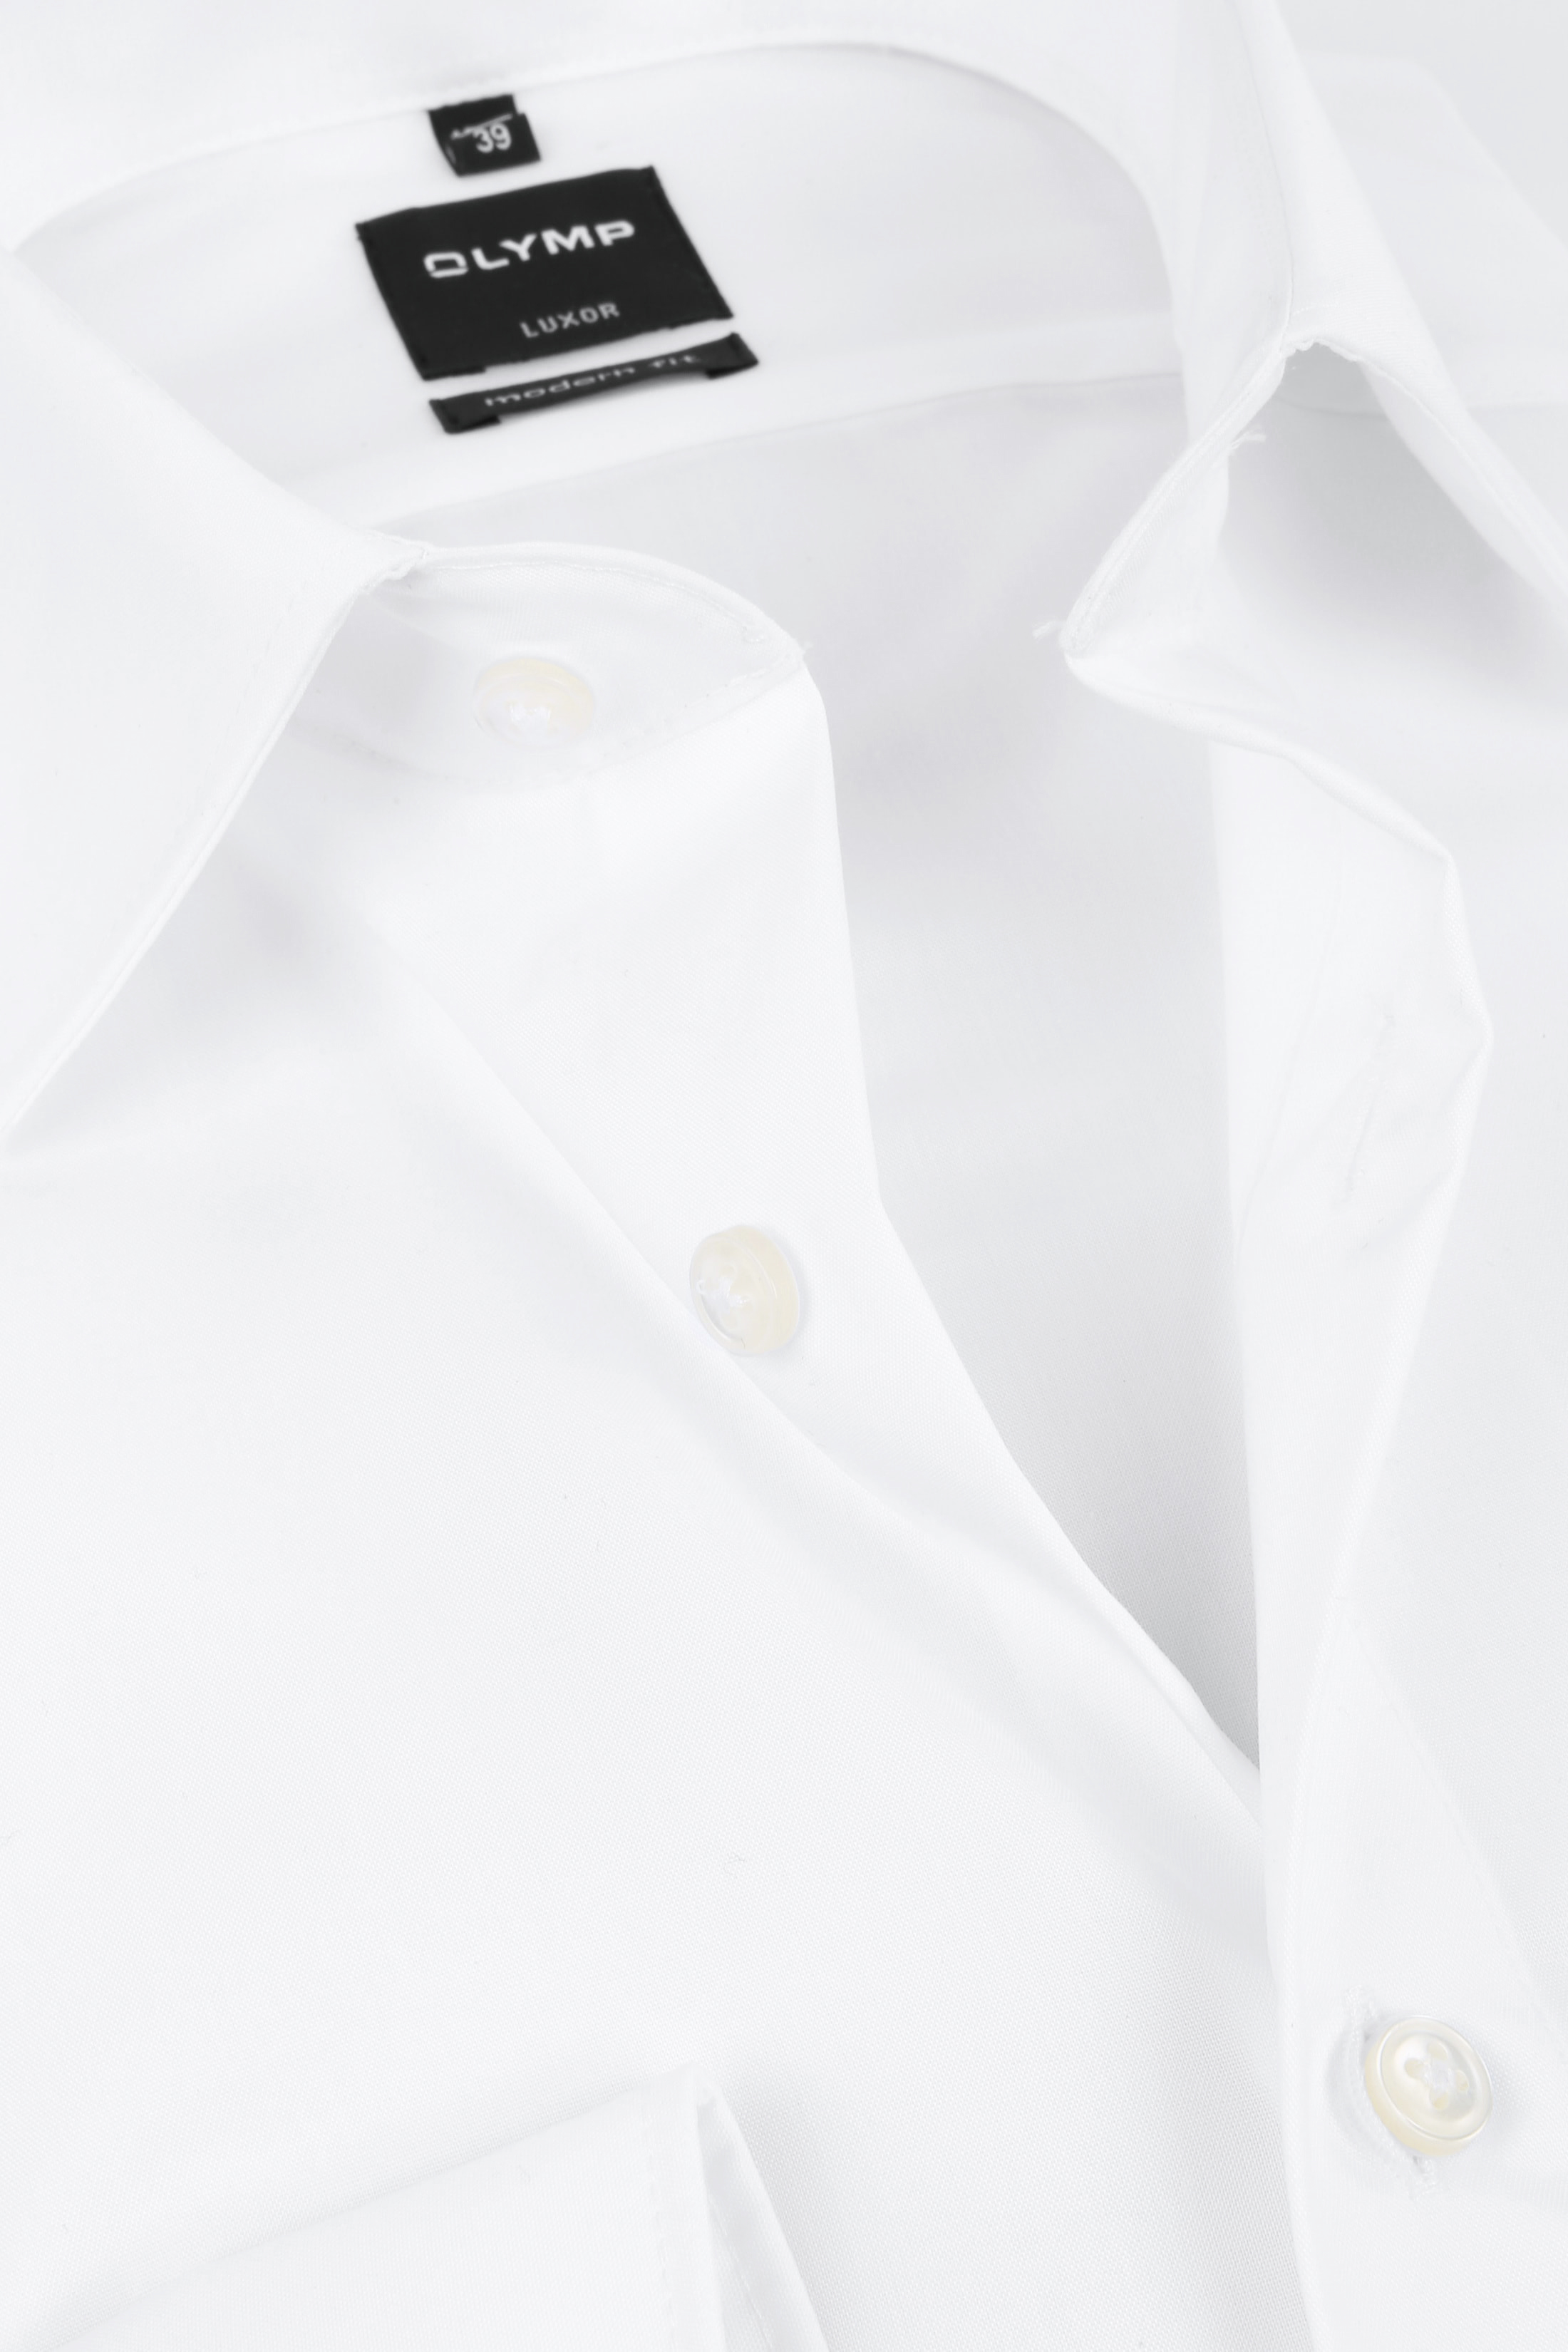 Olymp Overhemd Wit foto 1